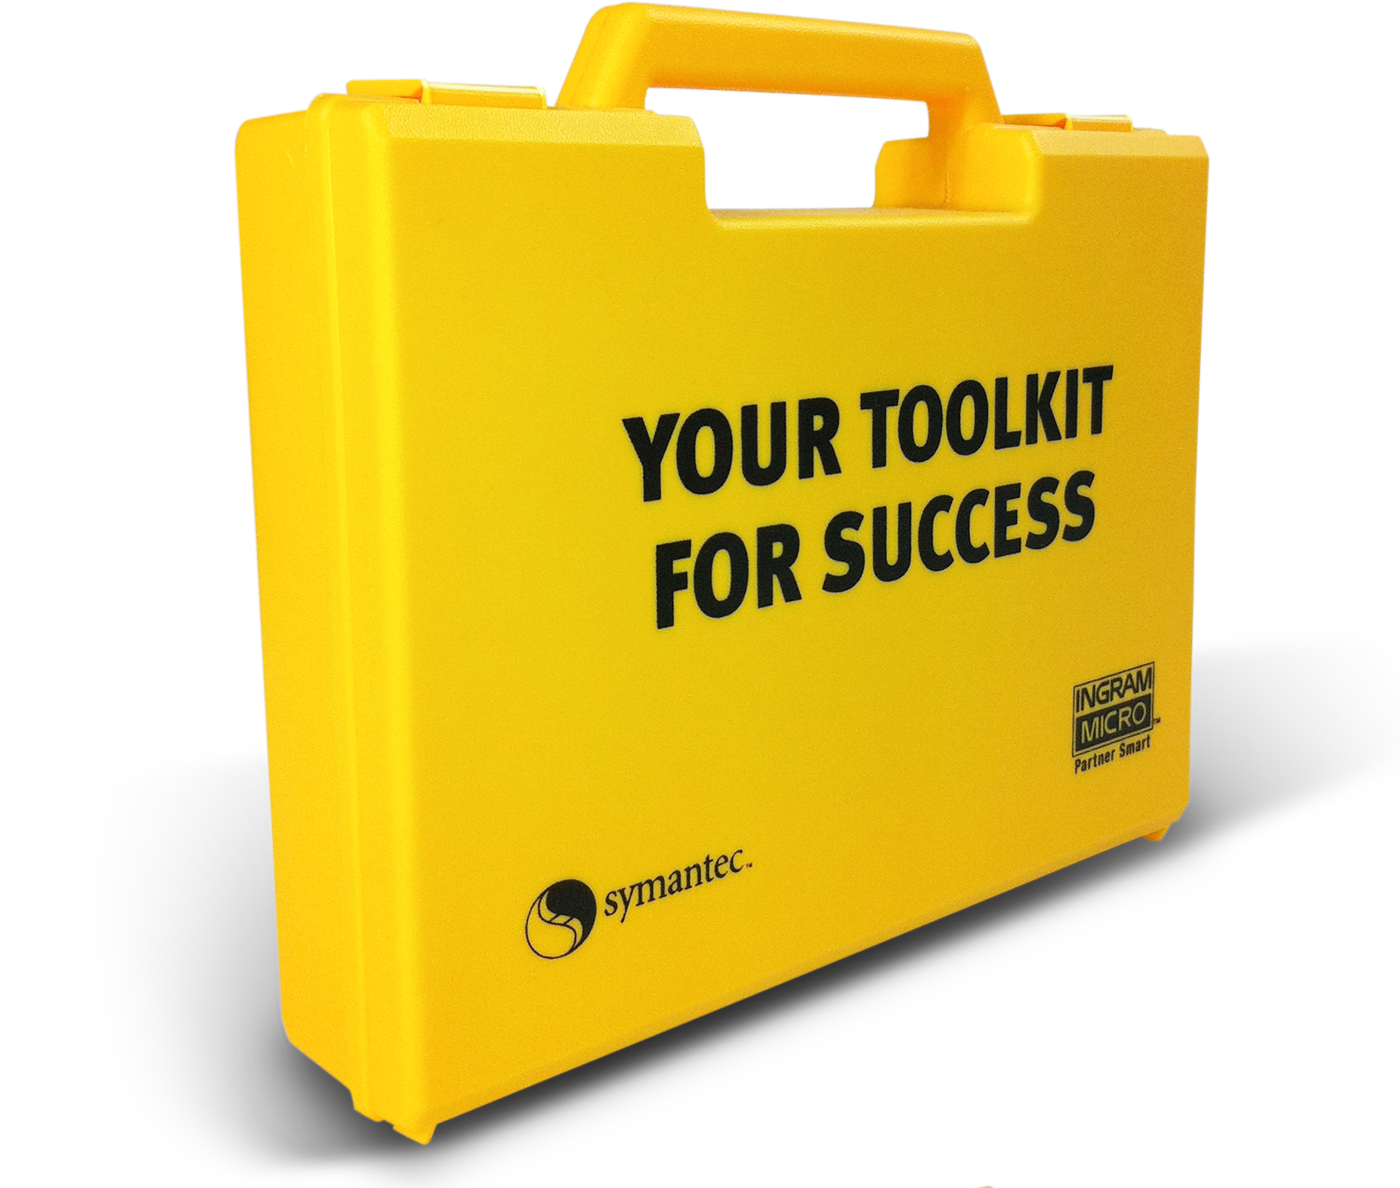 toolkit-box2